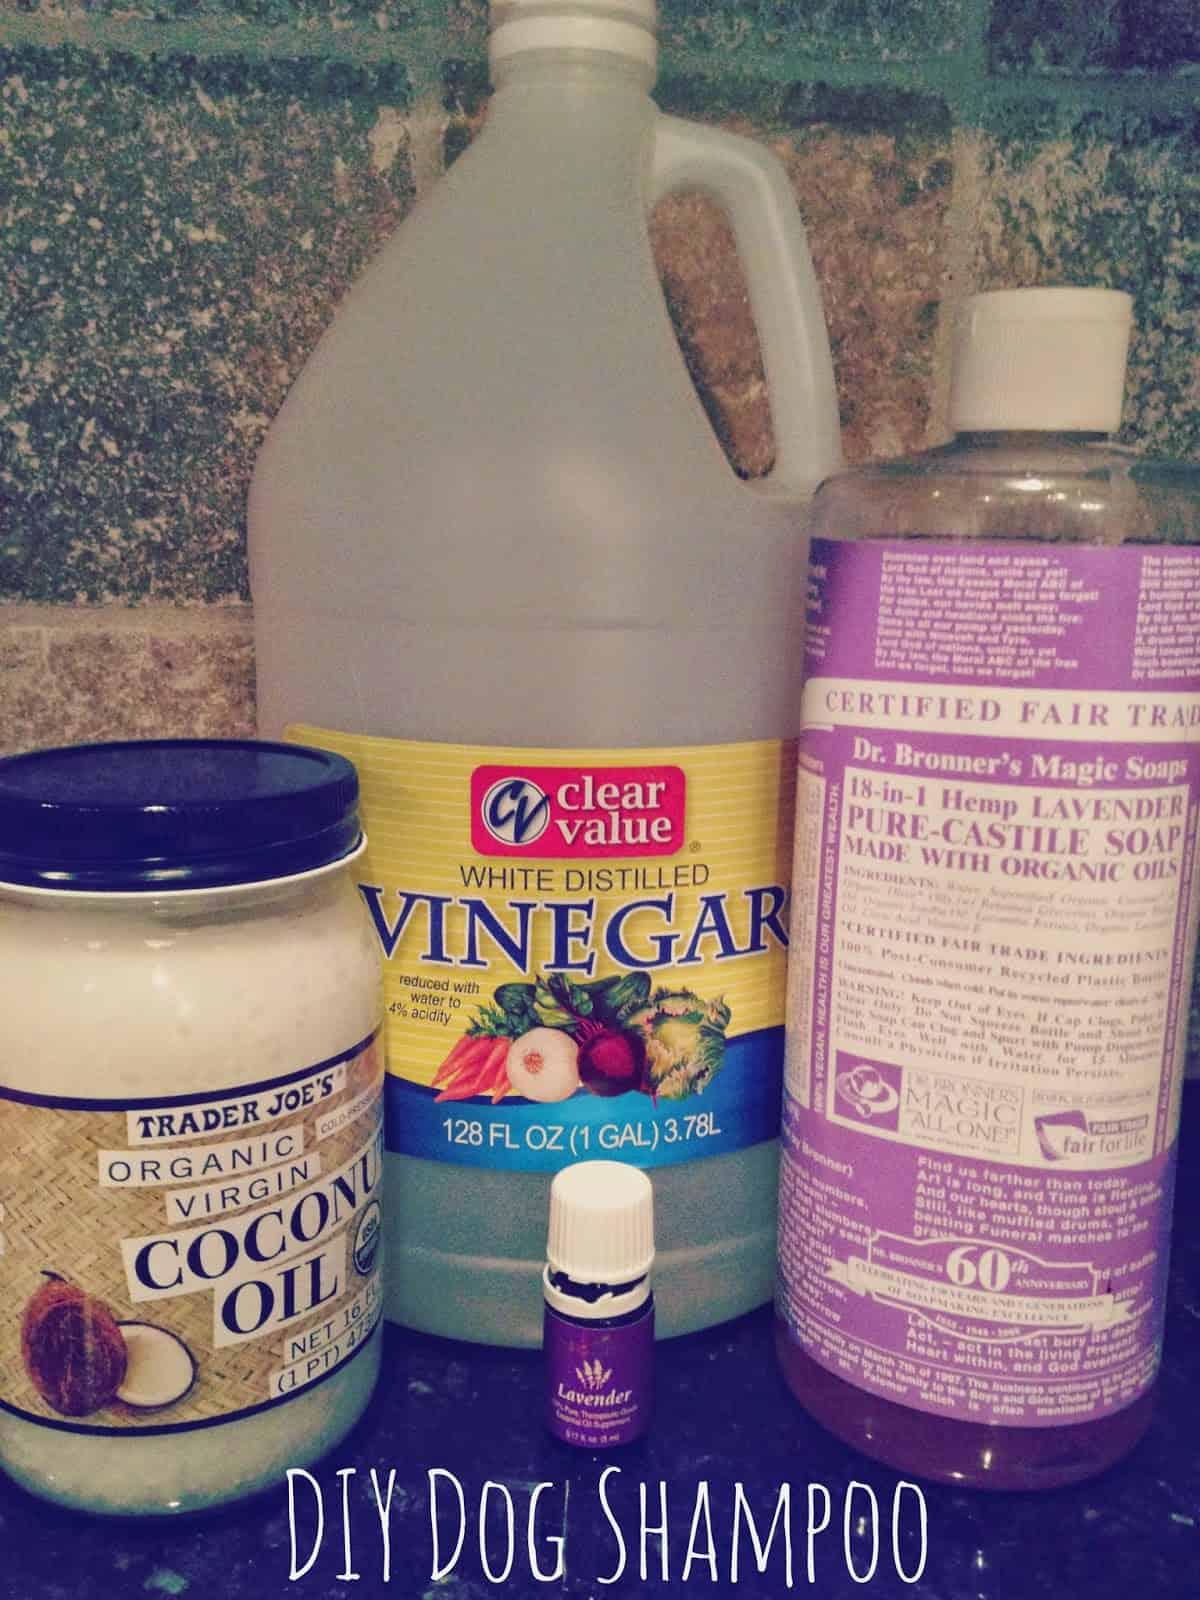 Coconut oil dog shampoo